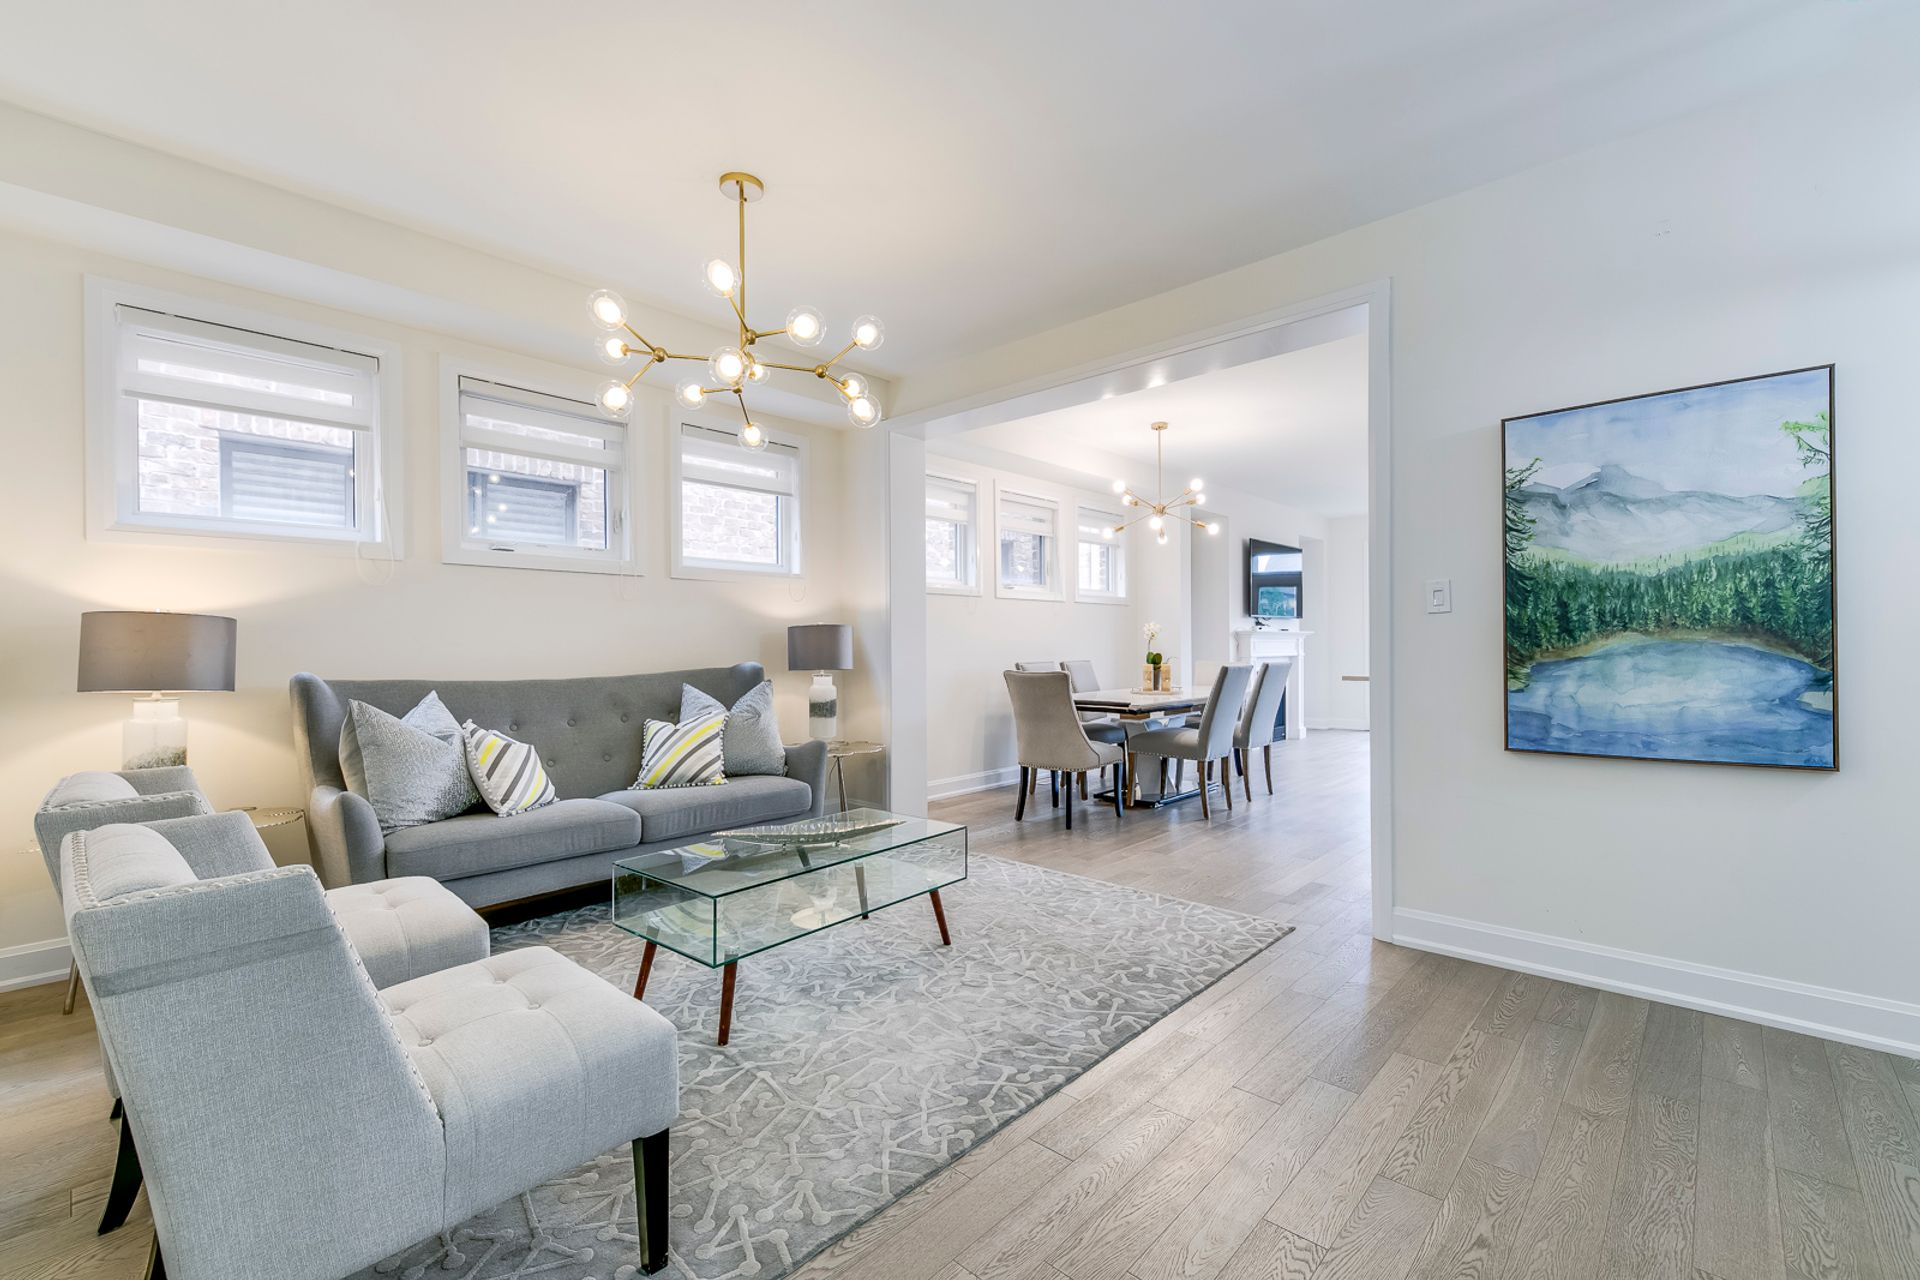 Living Room - 3129 Riverpath Common, Oakville - Elite3 & Team at 3129 Riverpath Common, Rural Oakville, Oakville